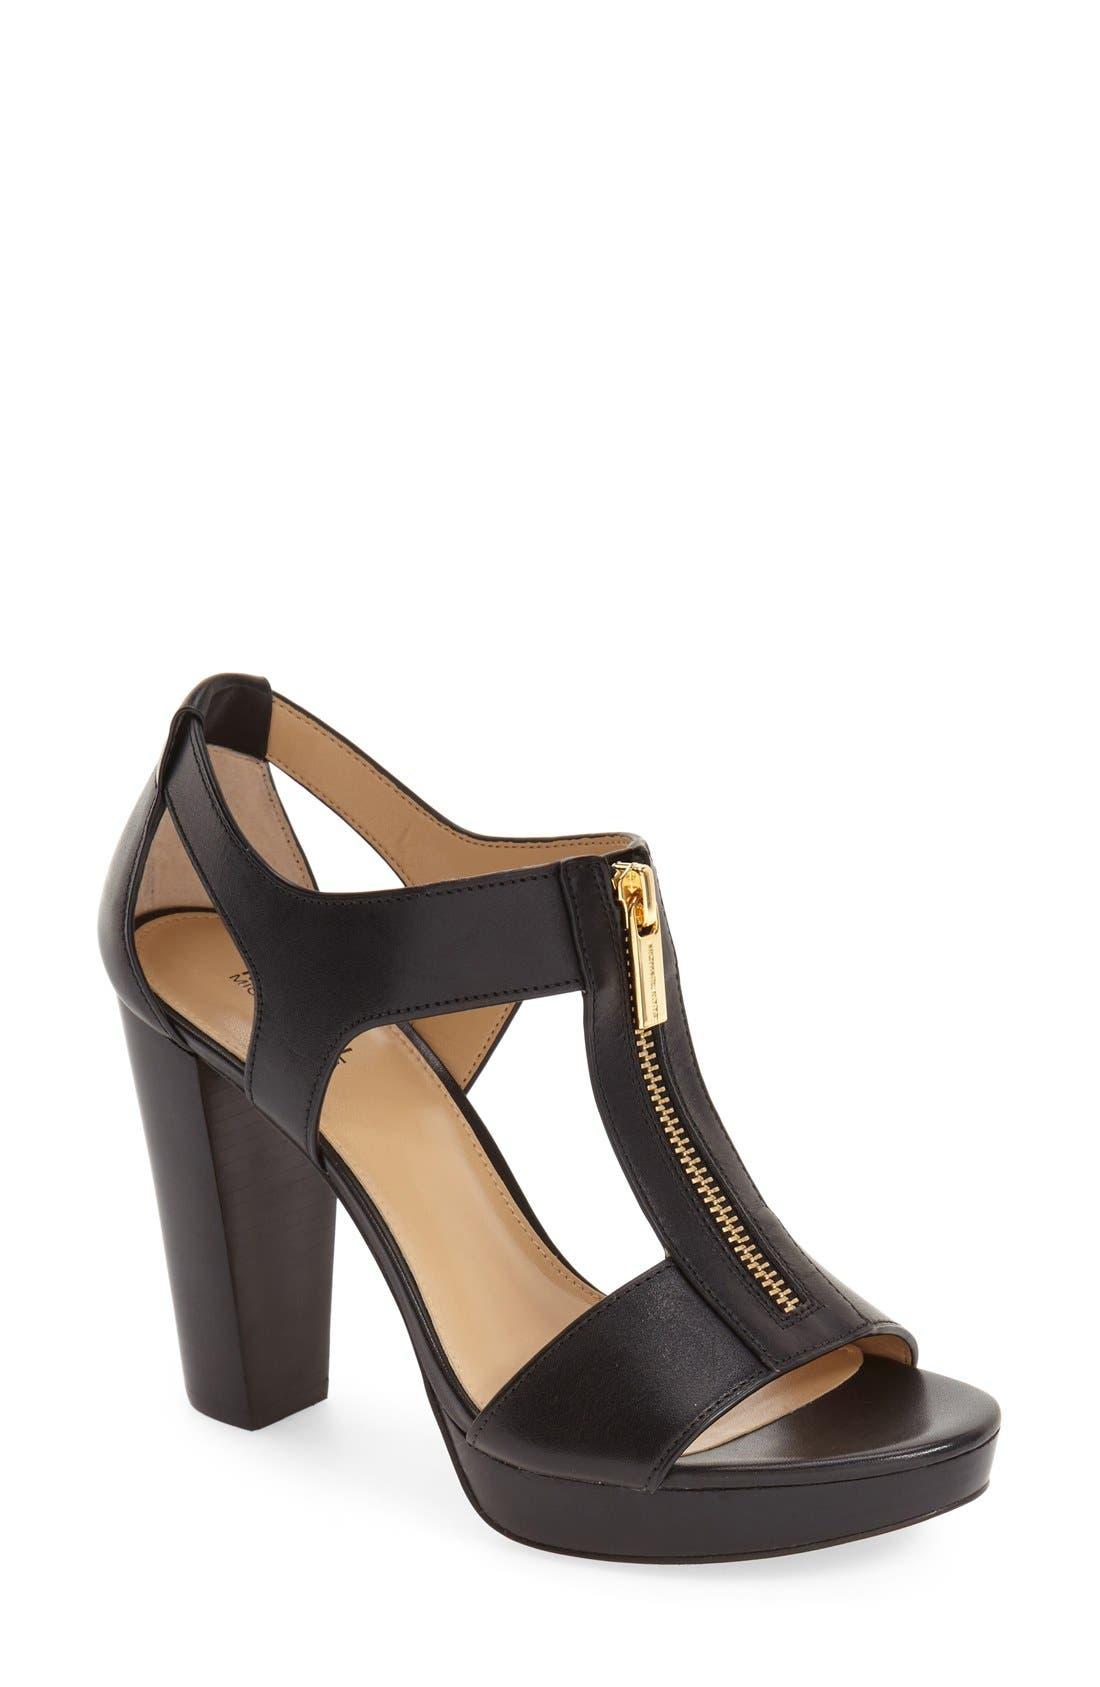 'Berkley' T-Strap Sandal,                             Main thumbnail 1, color,                             Black